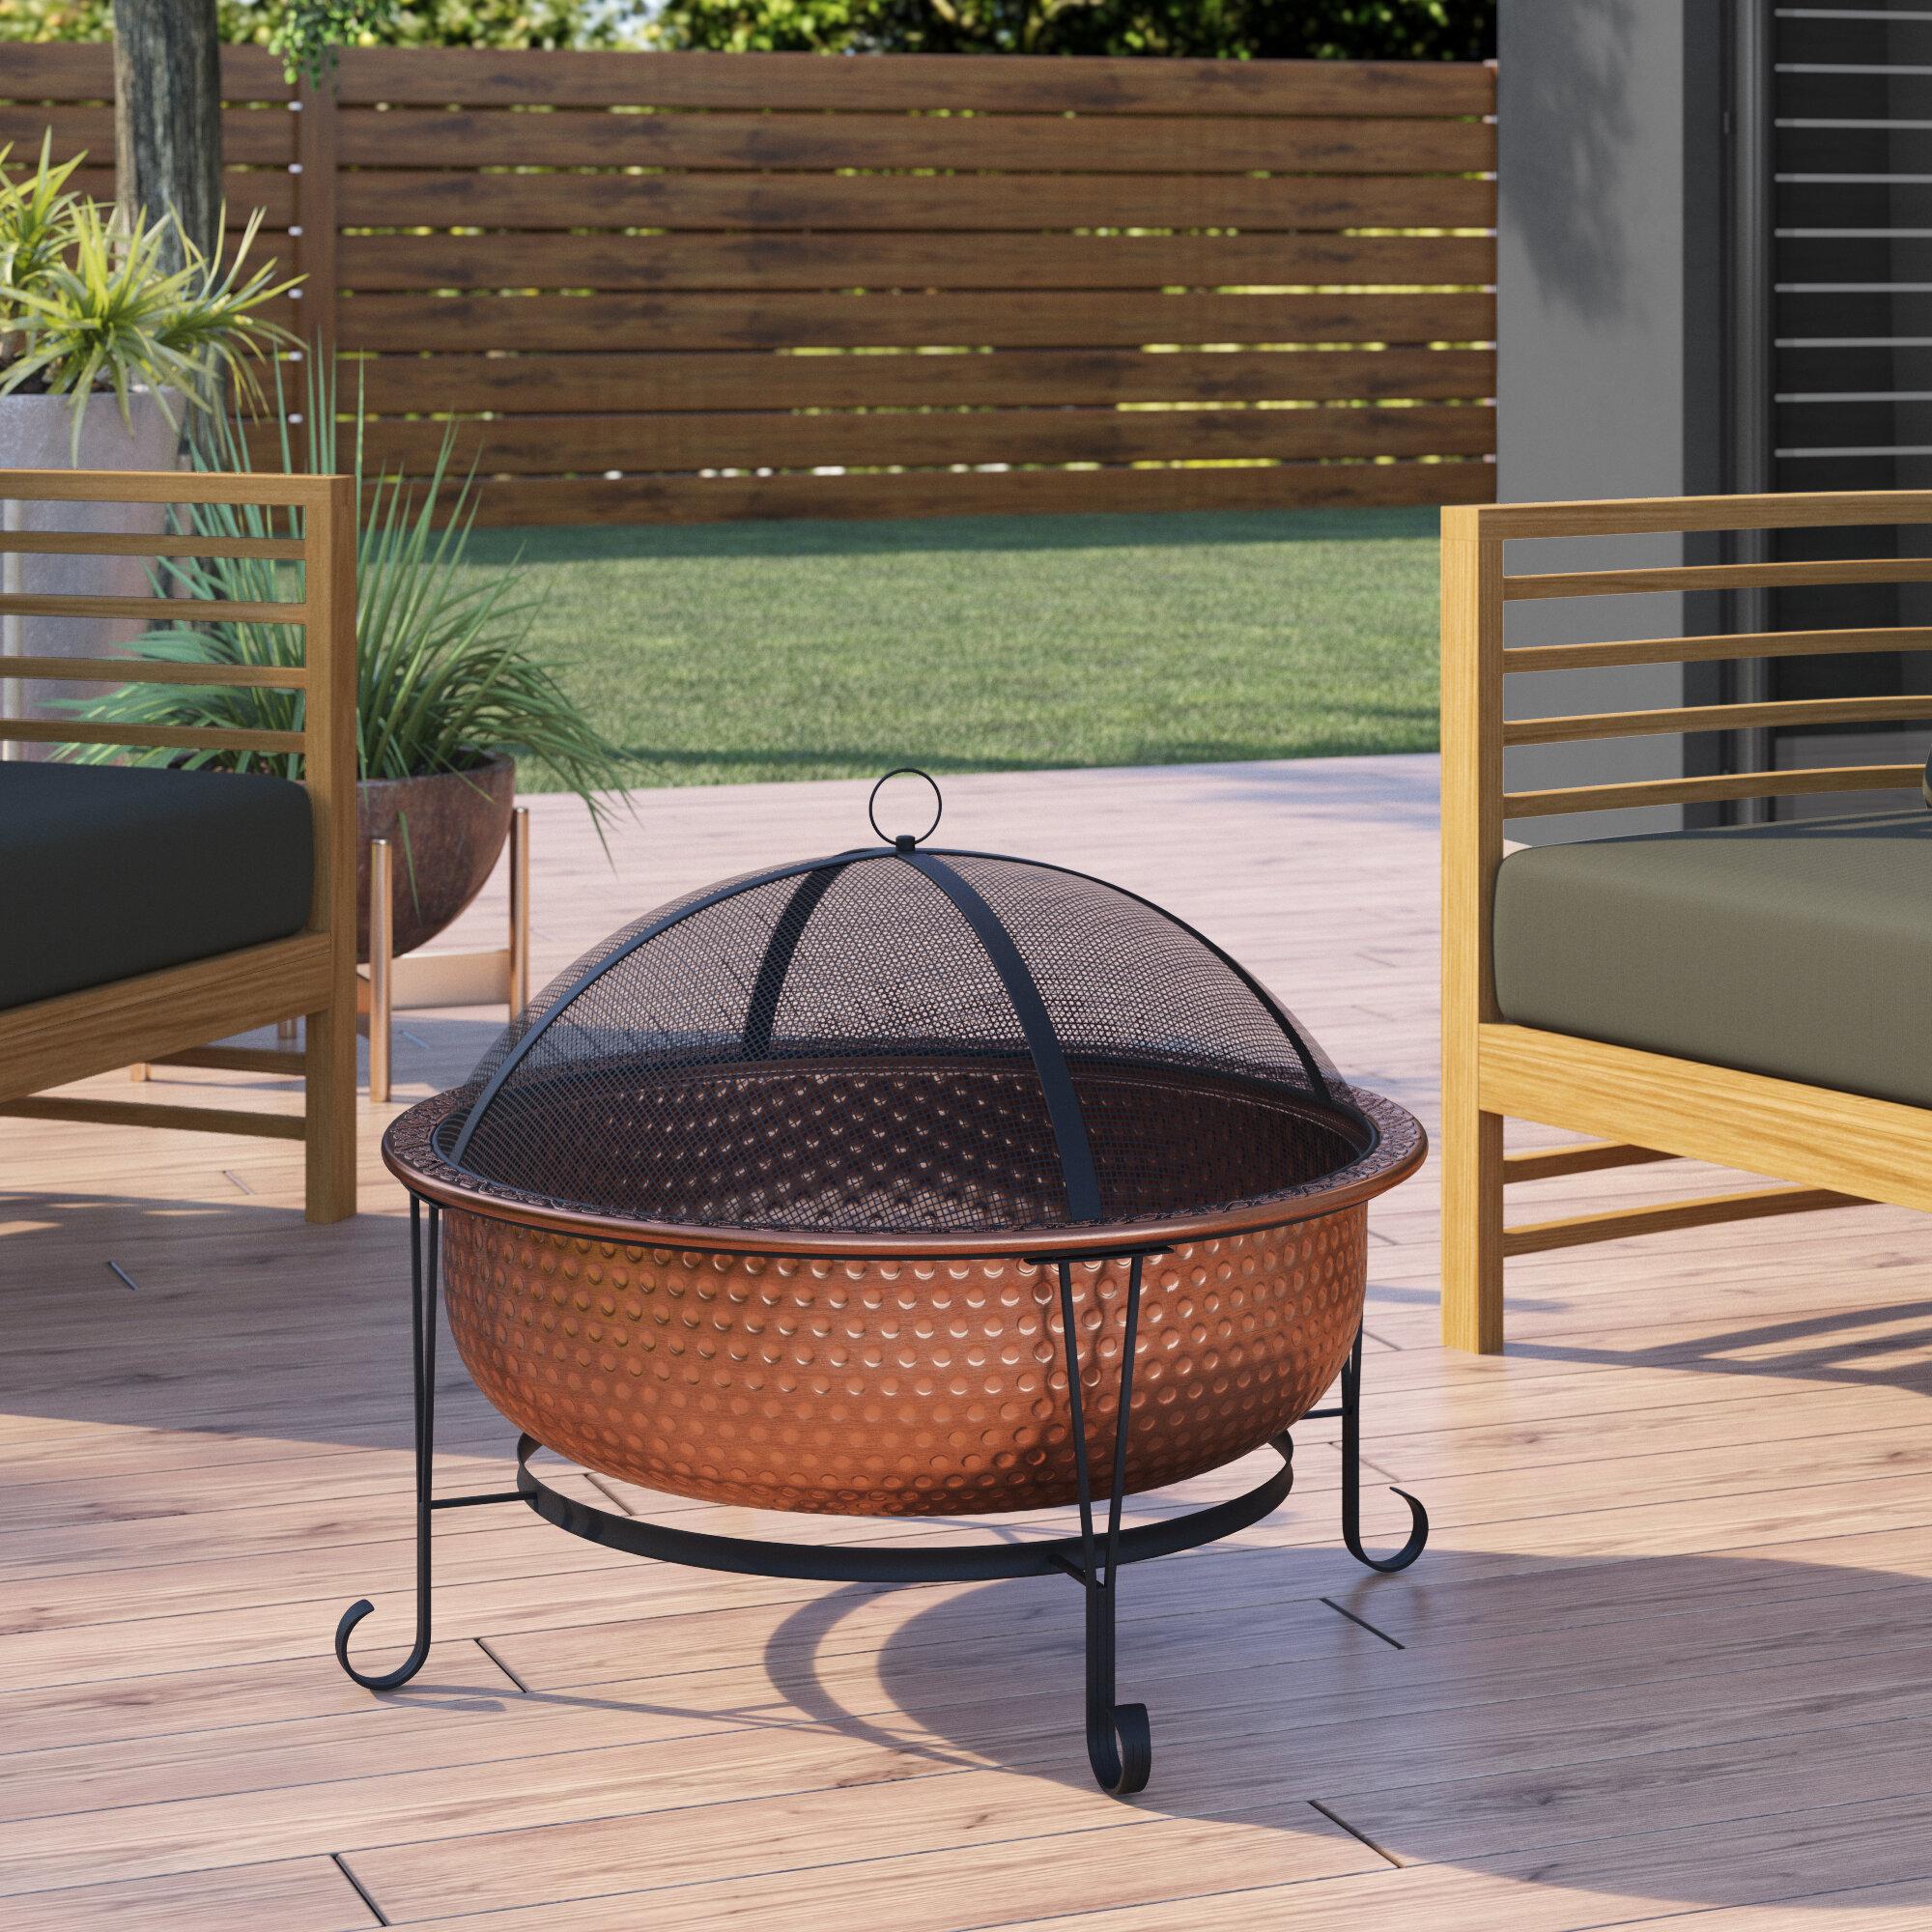 Latitude Run Absolon Copper Wood Burning Fire Pit Reviews Wayfair Ca